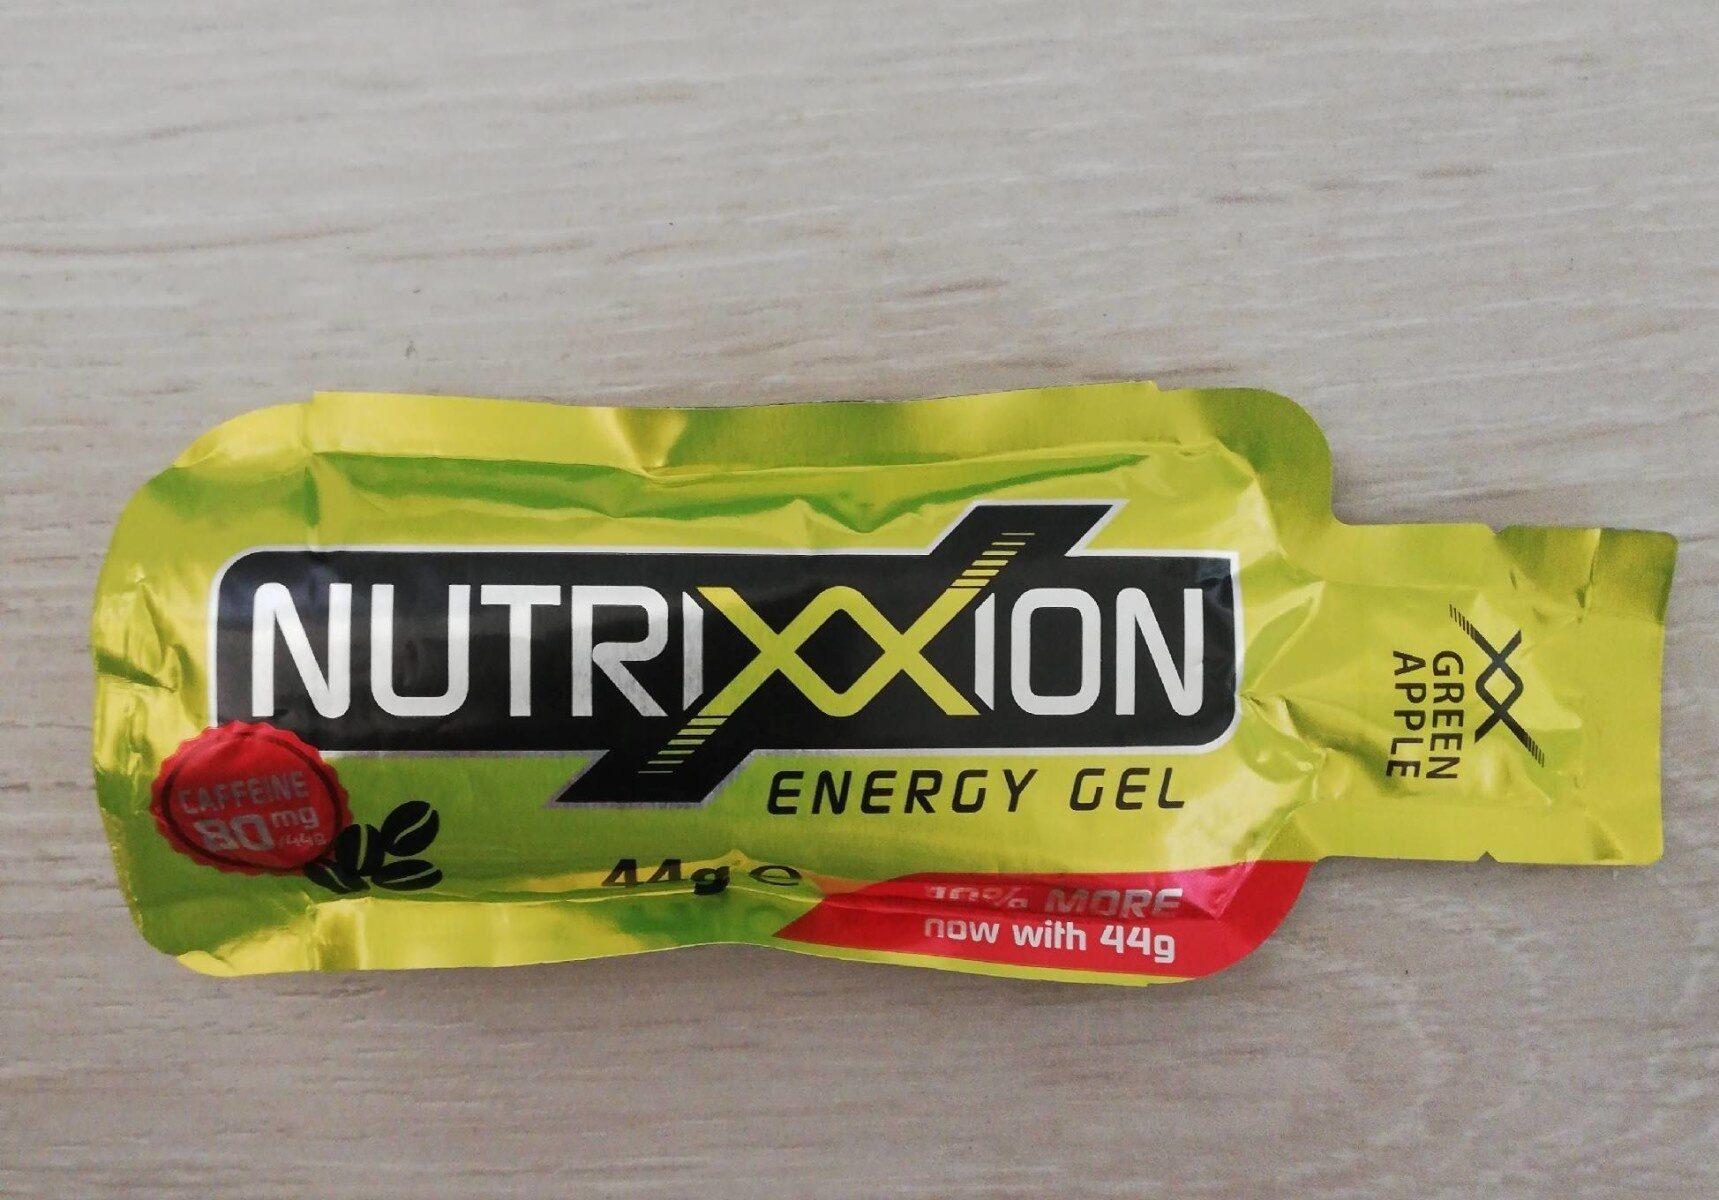 Nutrición ernergy gel - Product